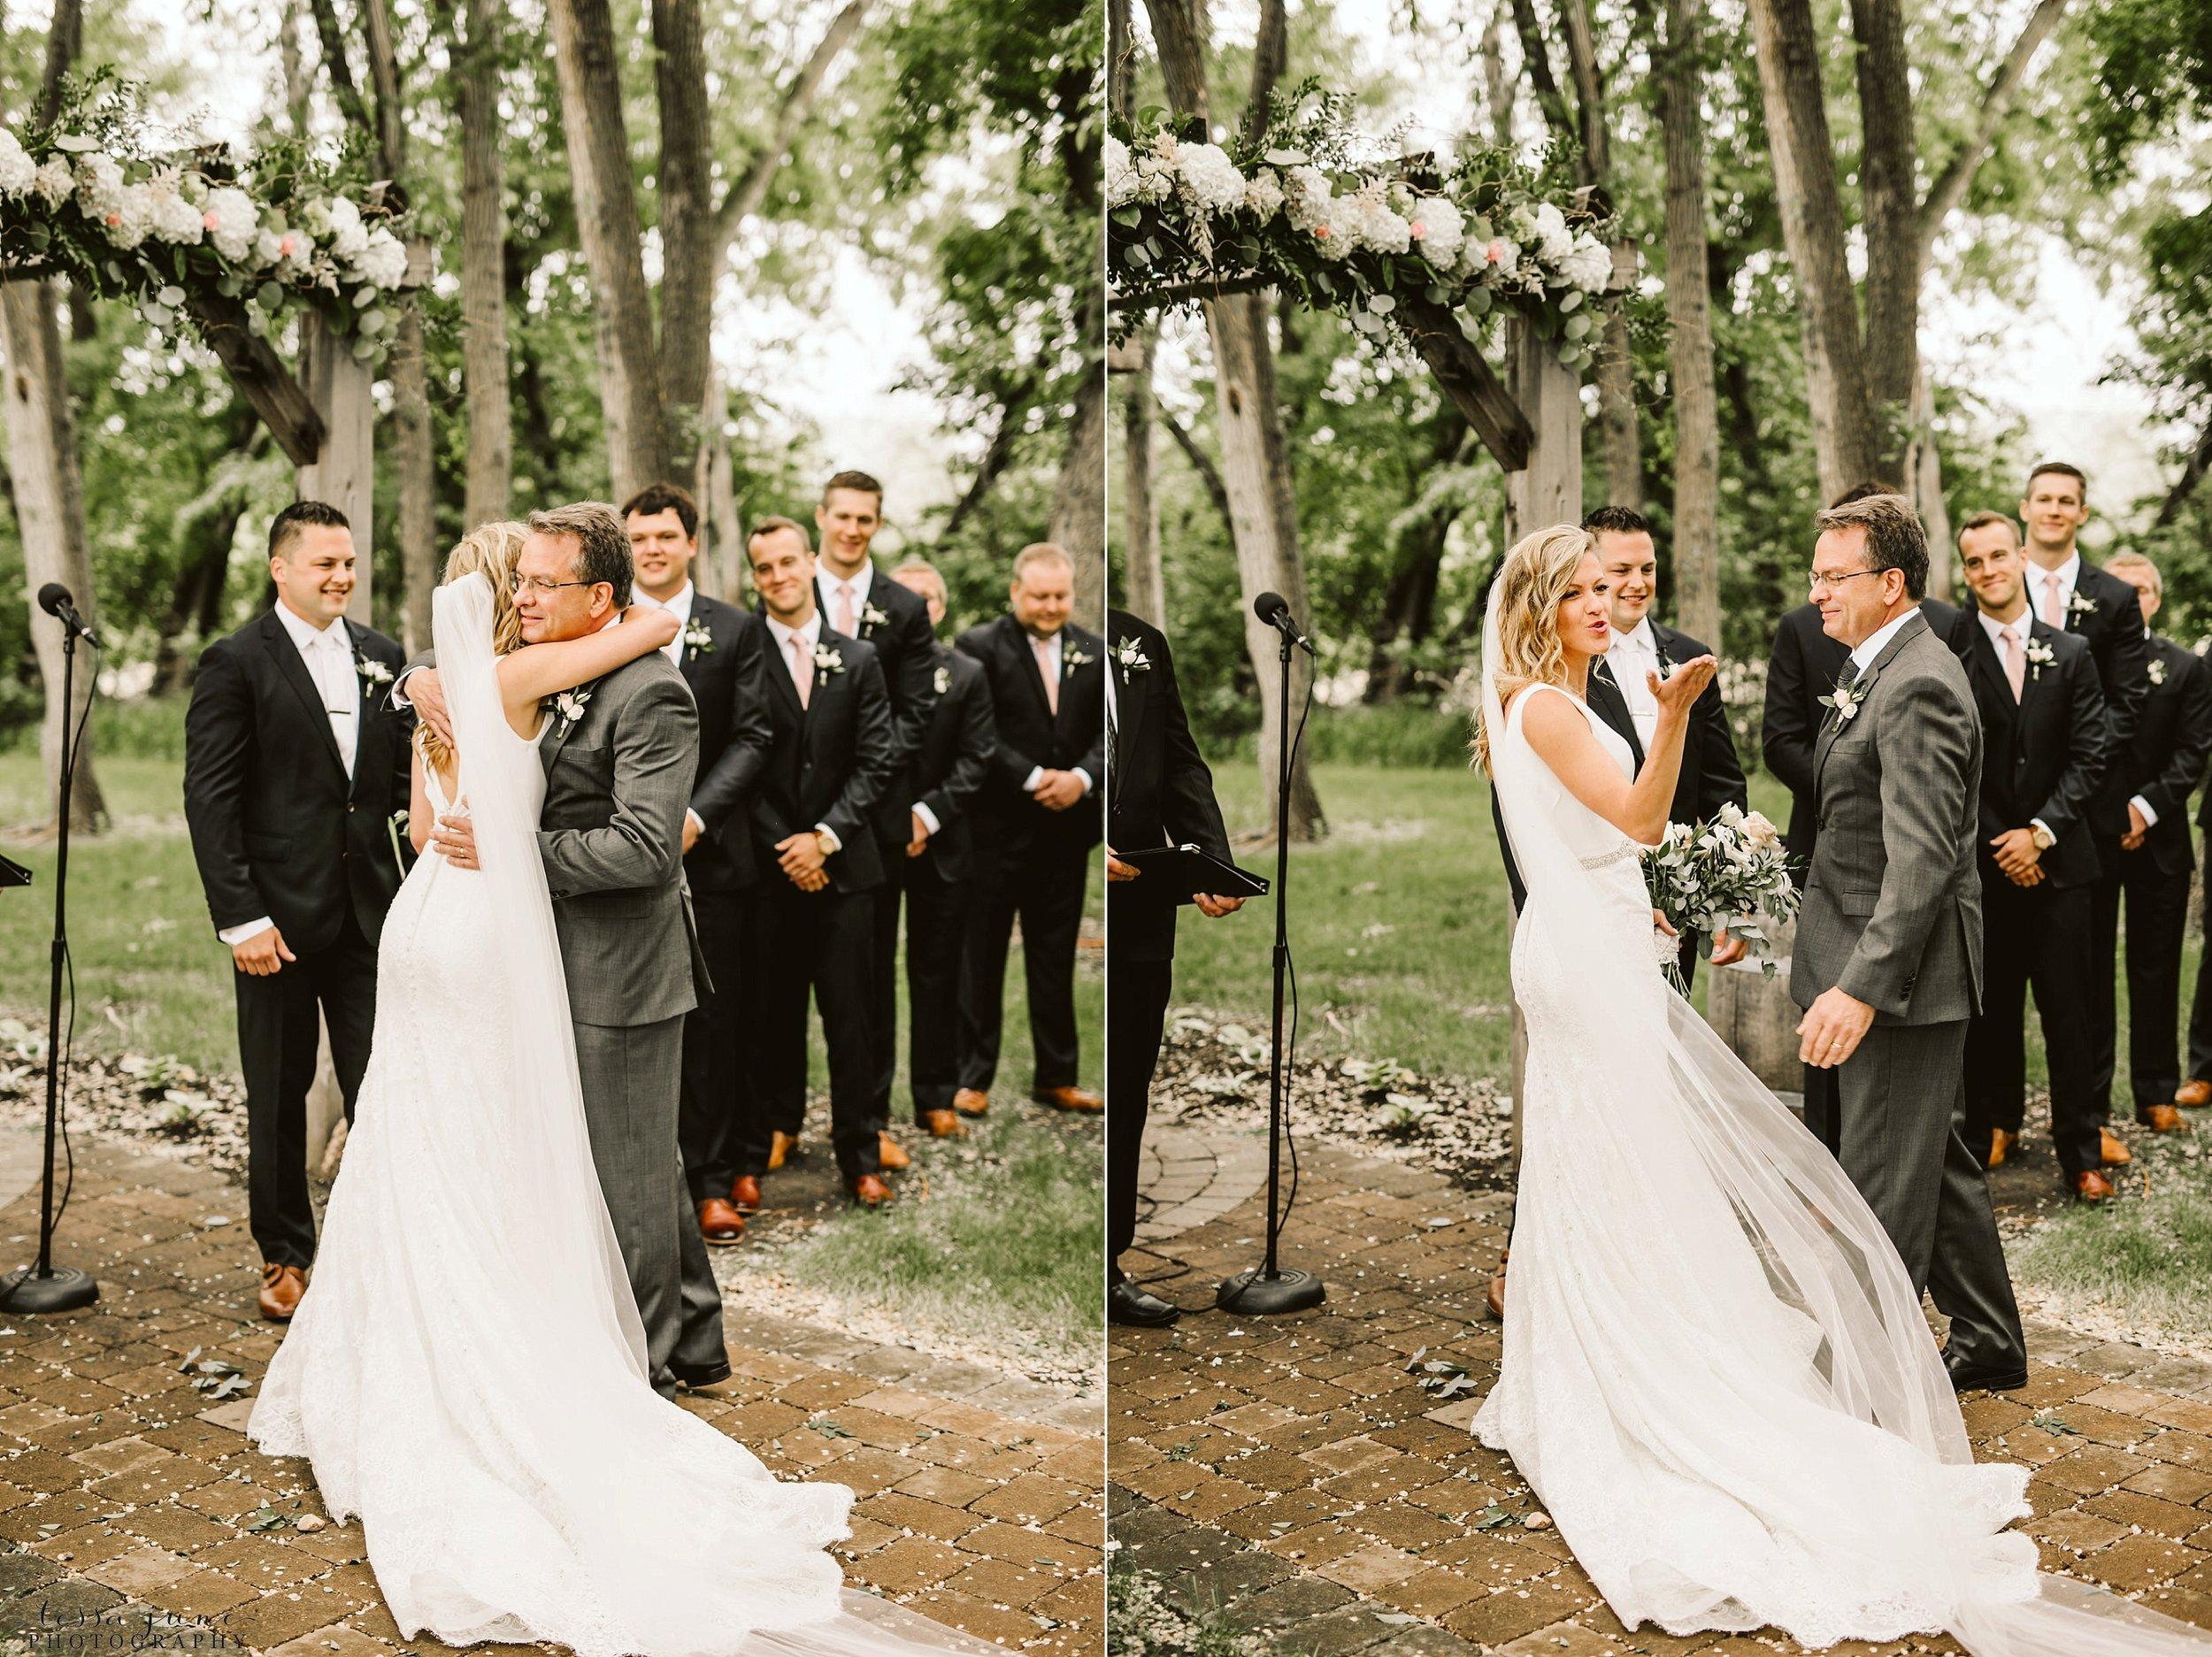 carlos-creek-winery-wedding-summer-pristine-floral-blush-pink-navy-alexandria-minnesota-107.jpg